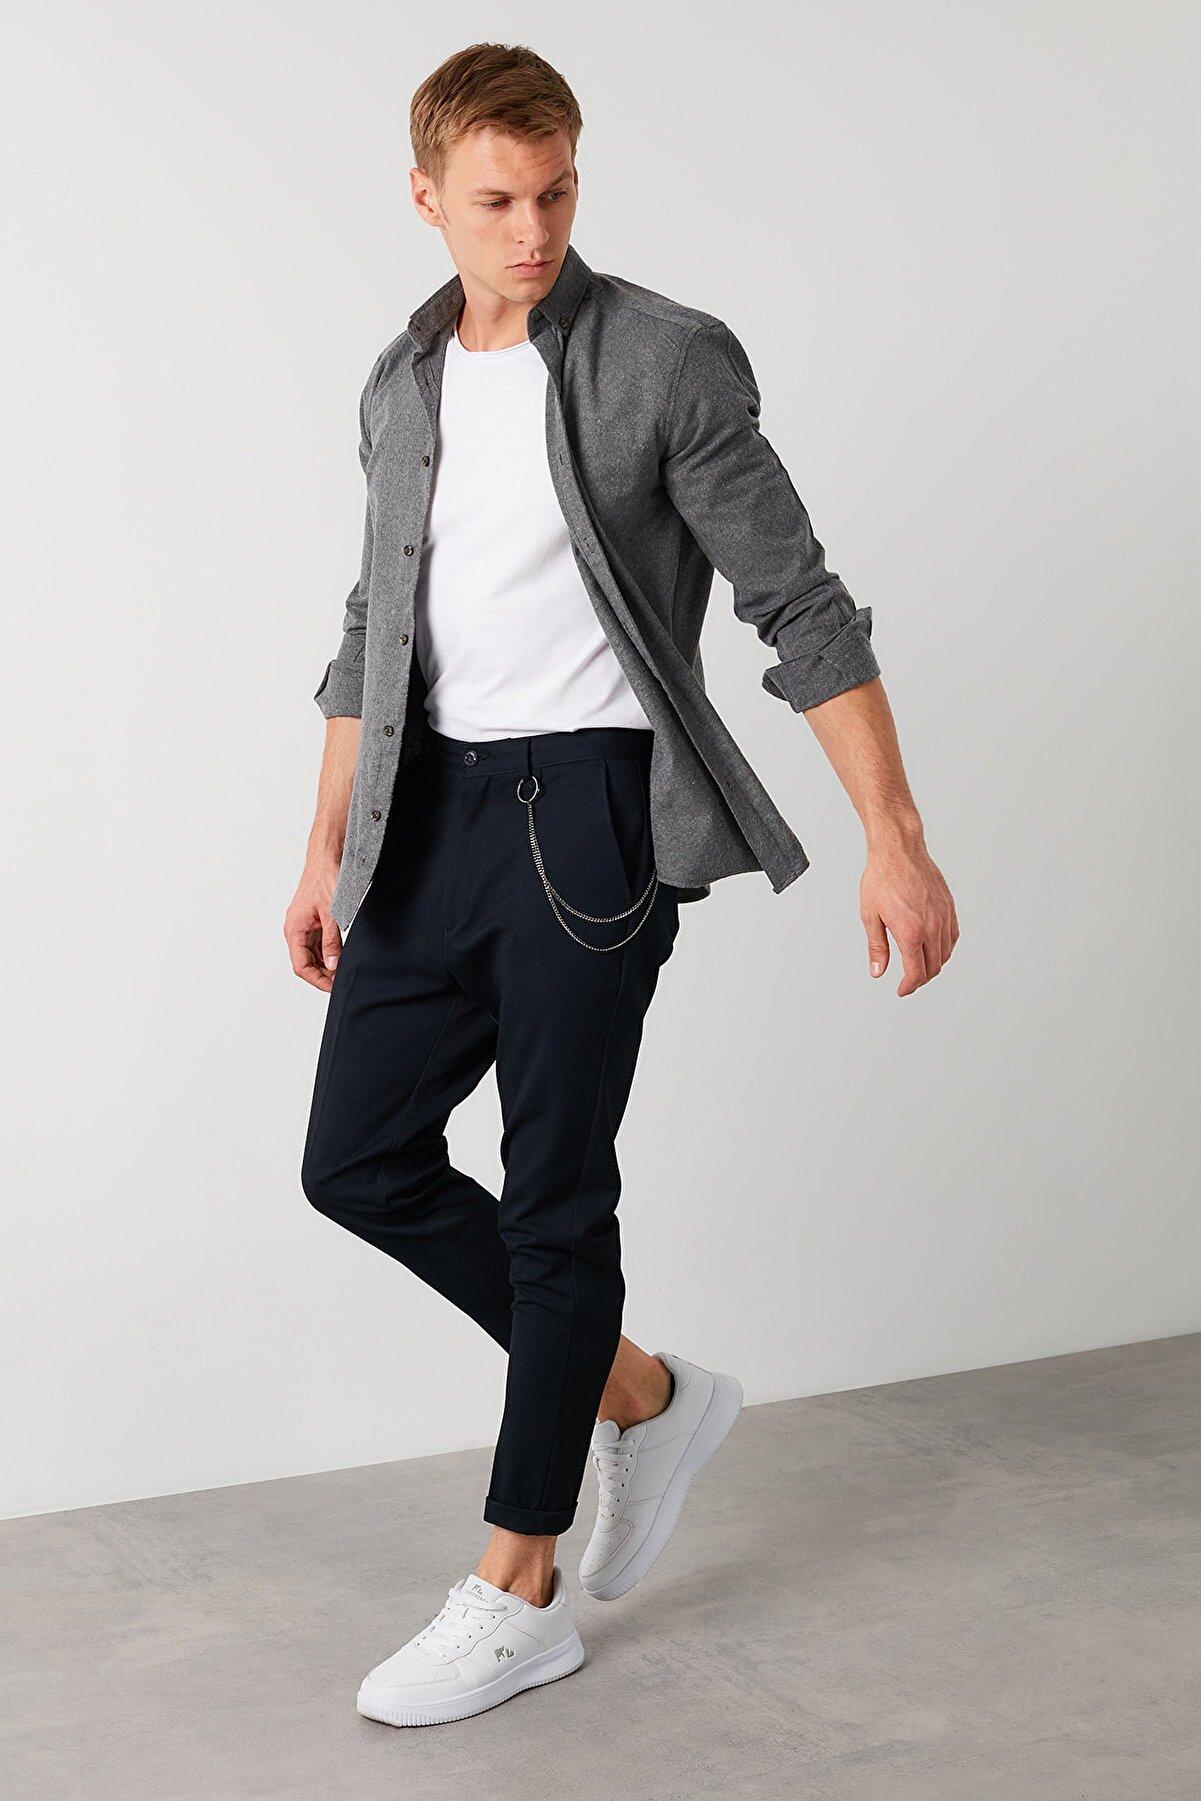 Buratti Erkek Gri Pamuklu Düğmeli Yaka Uzun Kollu Oduncu Gömlek Cf21w112238